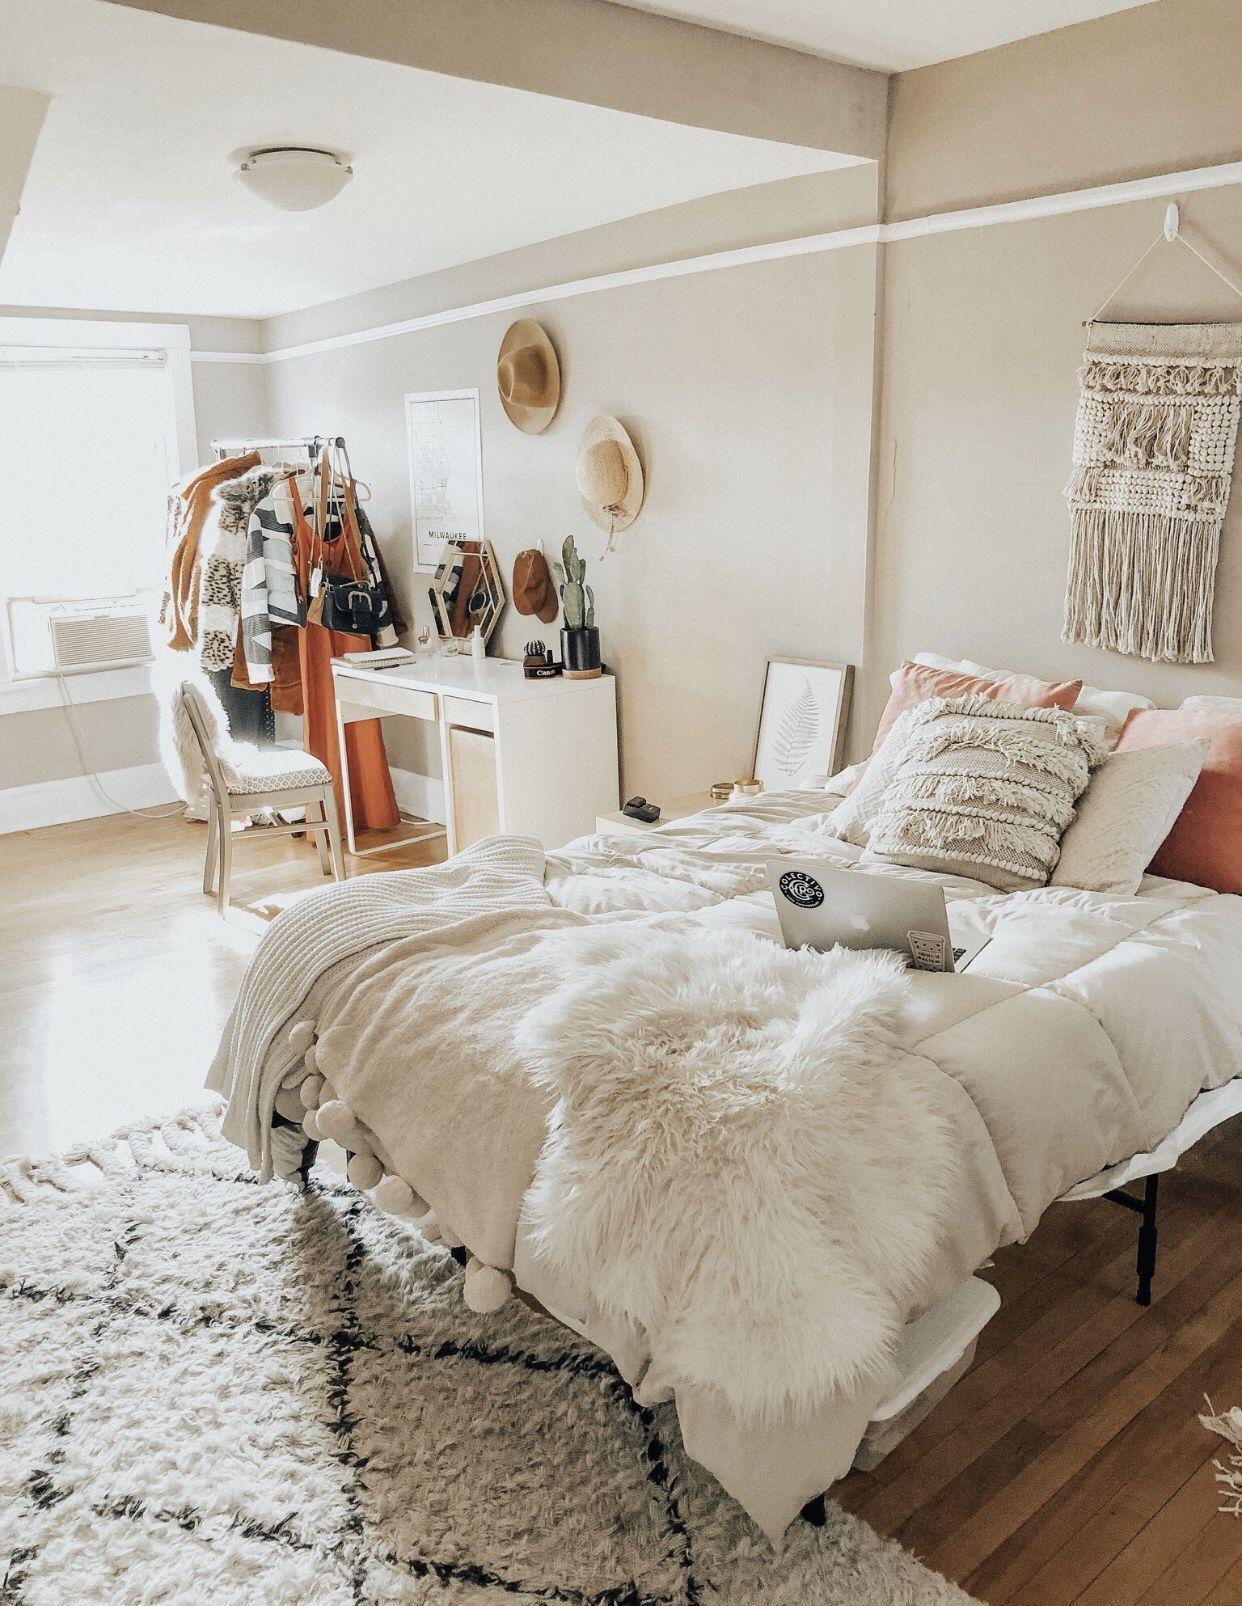 Cute Bedrooms Interior Design Ideas 2020 With Images Cozy Dorm